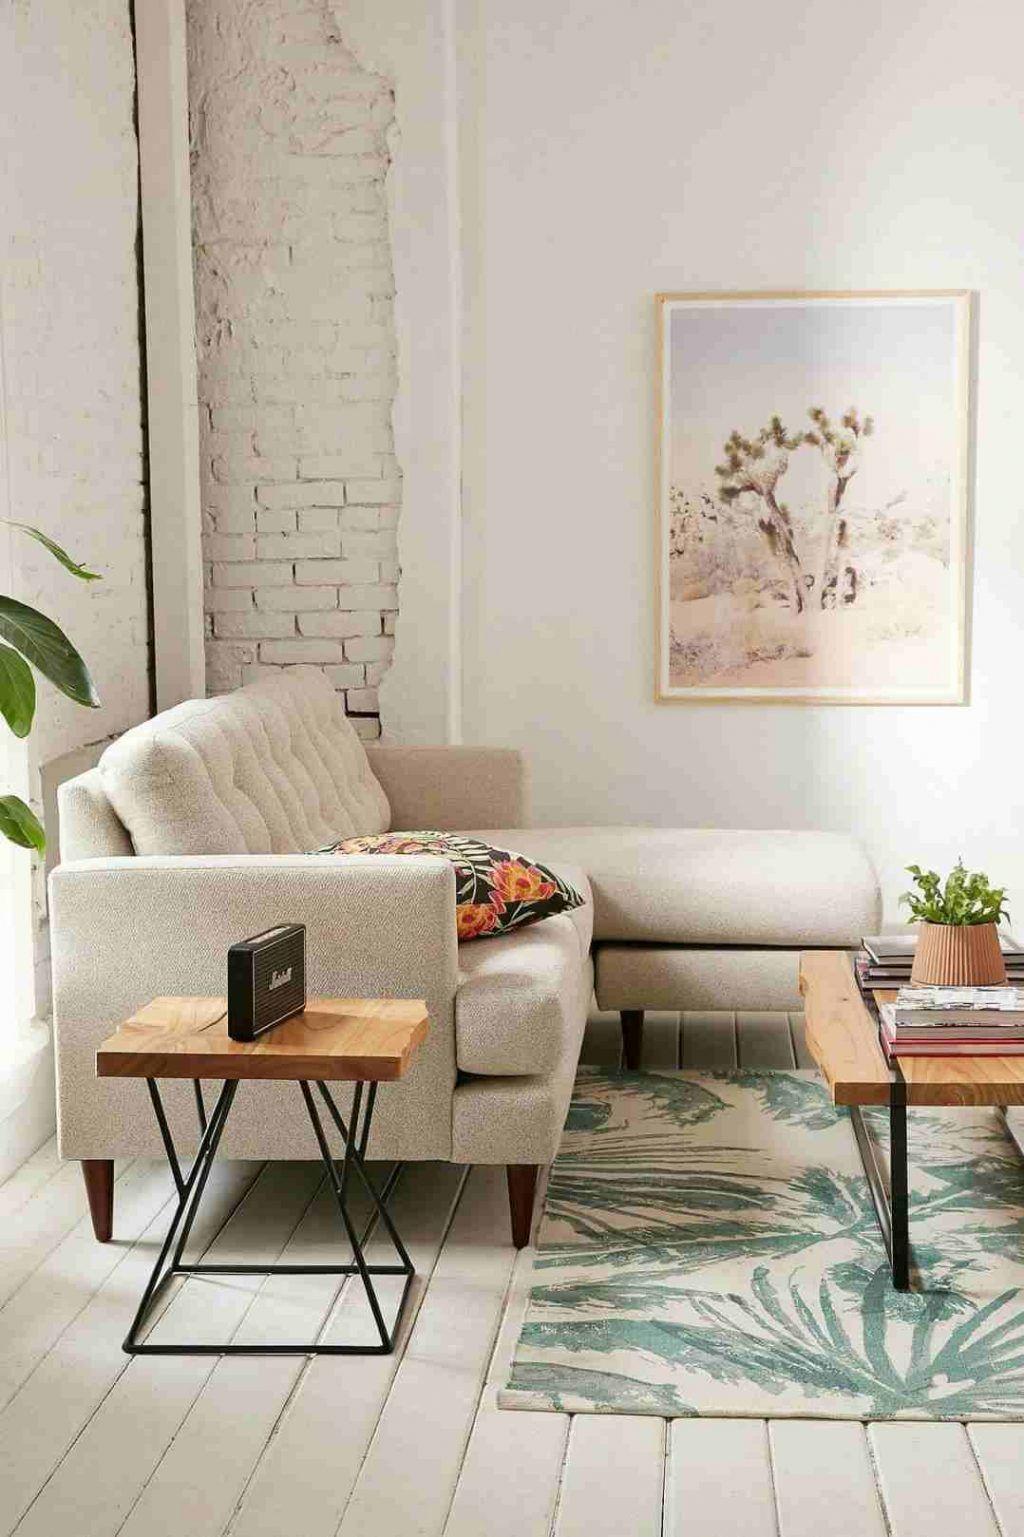 Lagom In Your Home The Scandinavian Decor Trend Wonder Forest Home Decor Living Room Scandinavian Living Room Designs